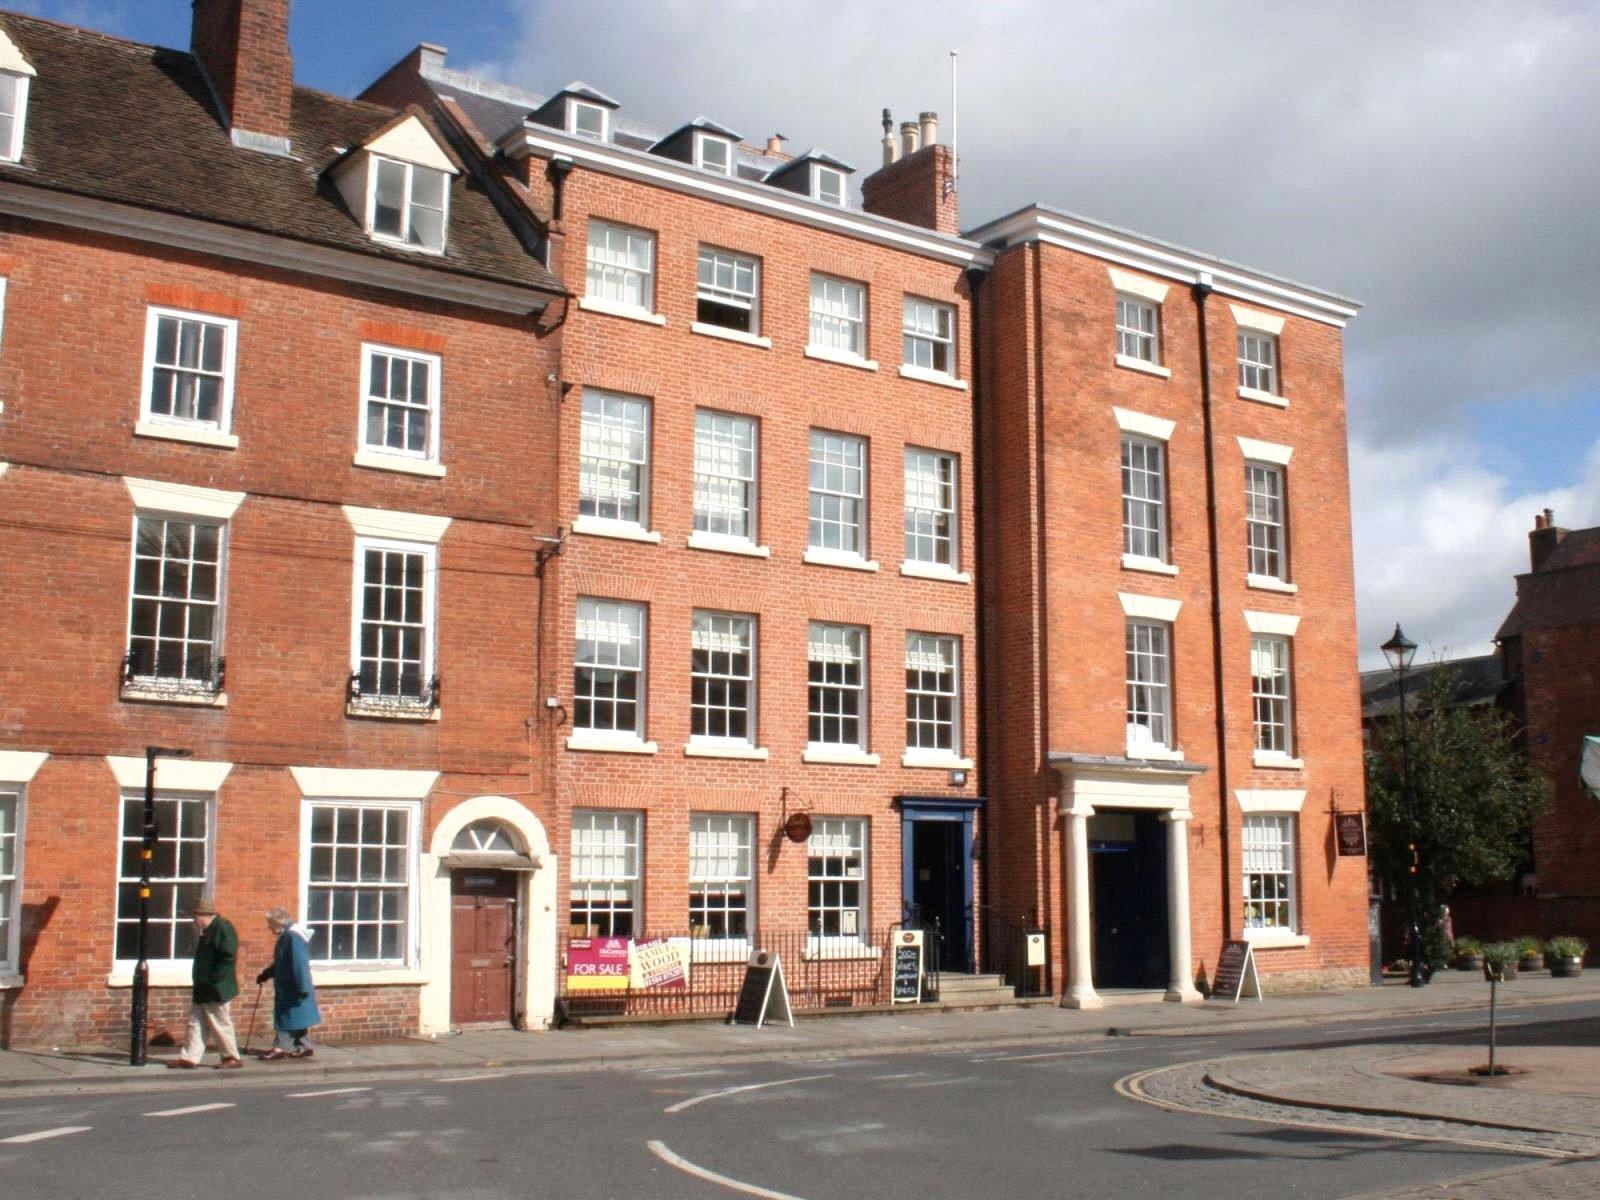 Flat 11, 16 Castle Street, Ludlow, Shropshire, SY8